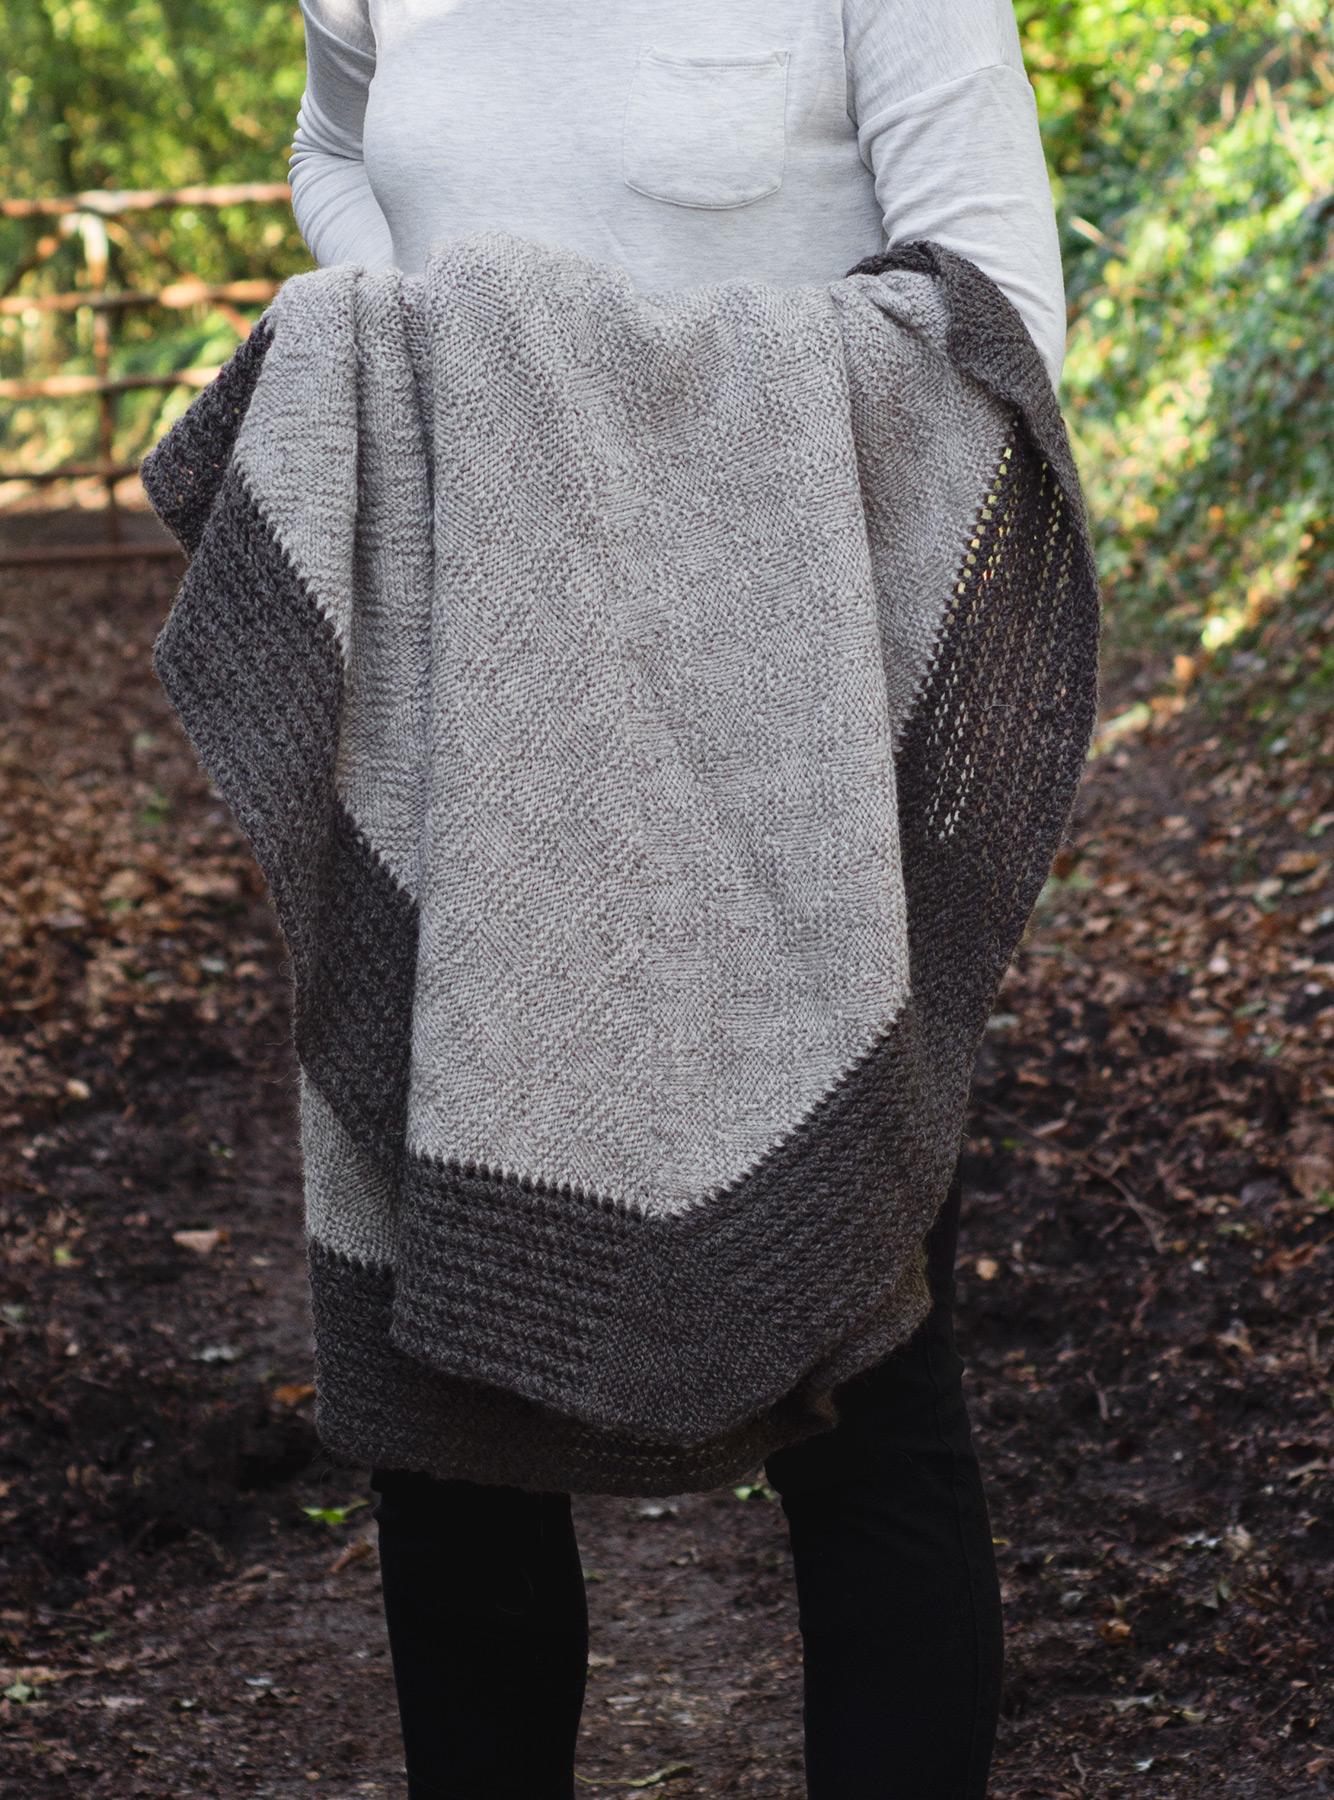 Closeup of knitted diamonds